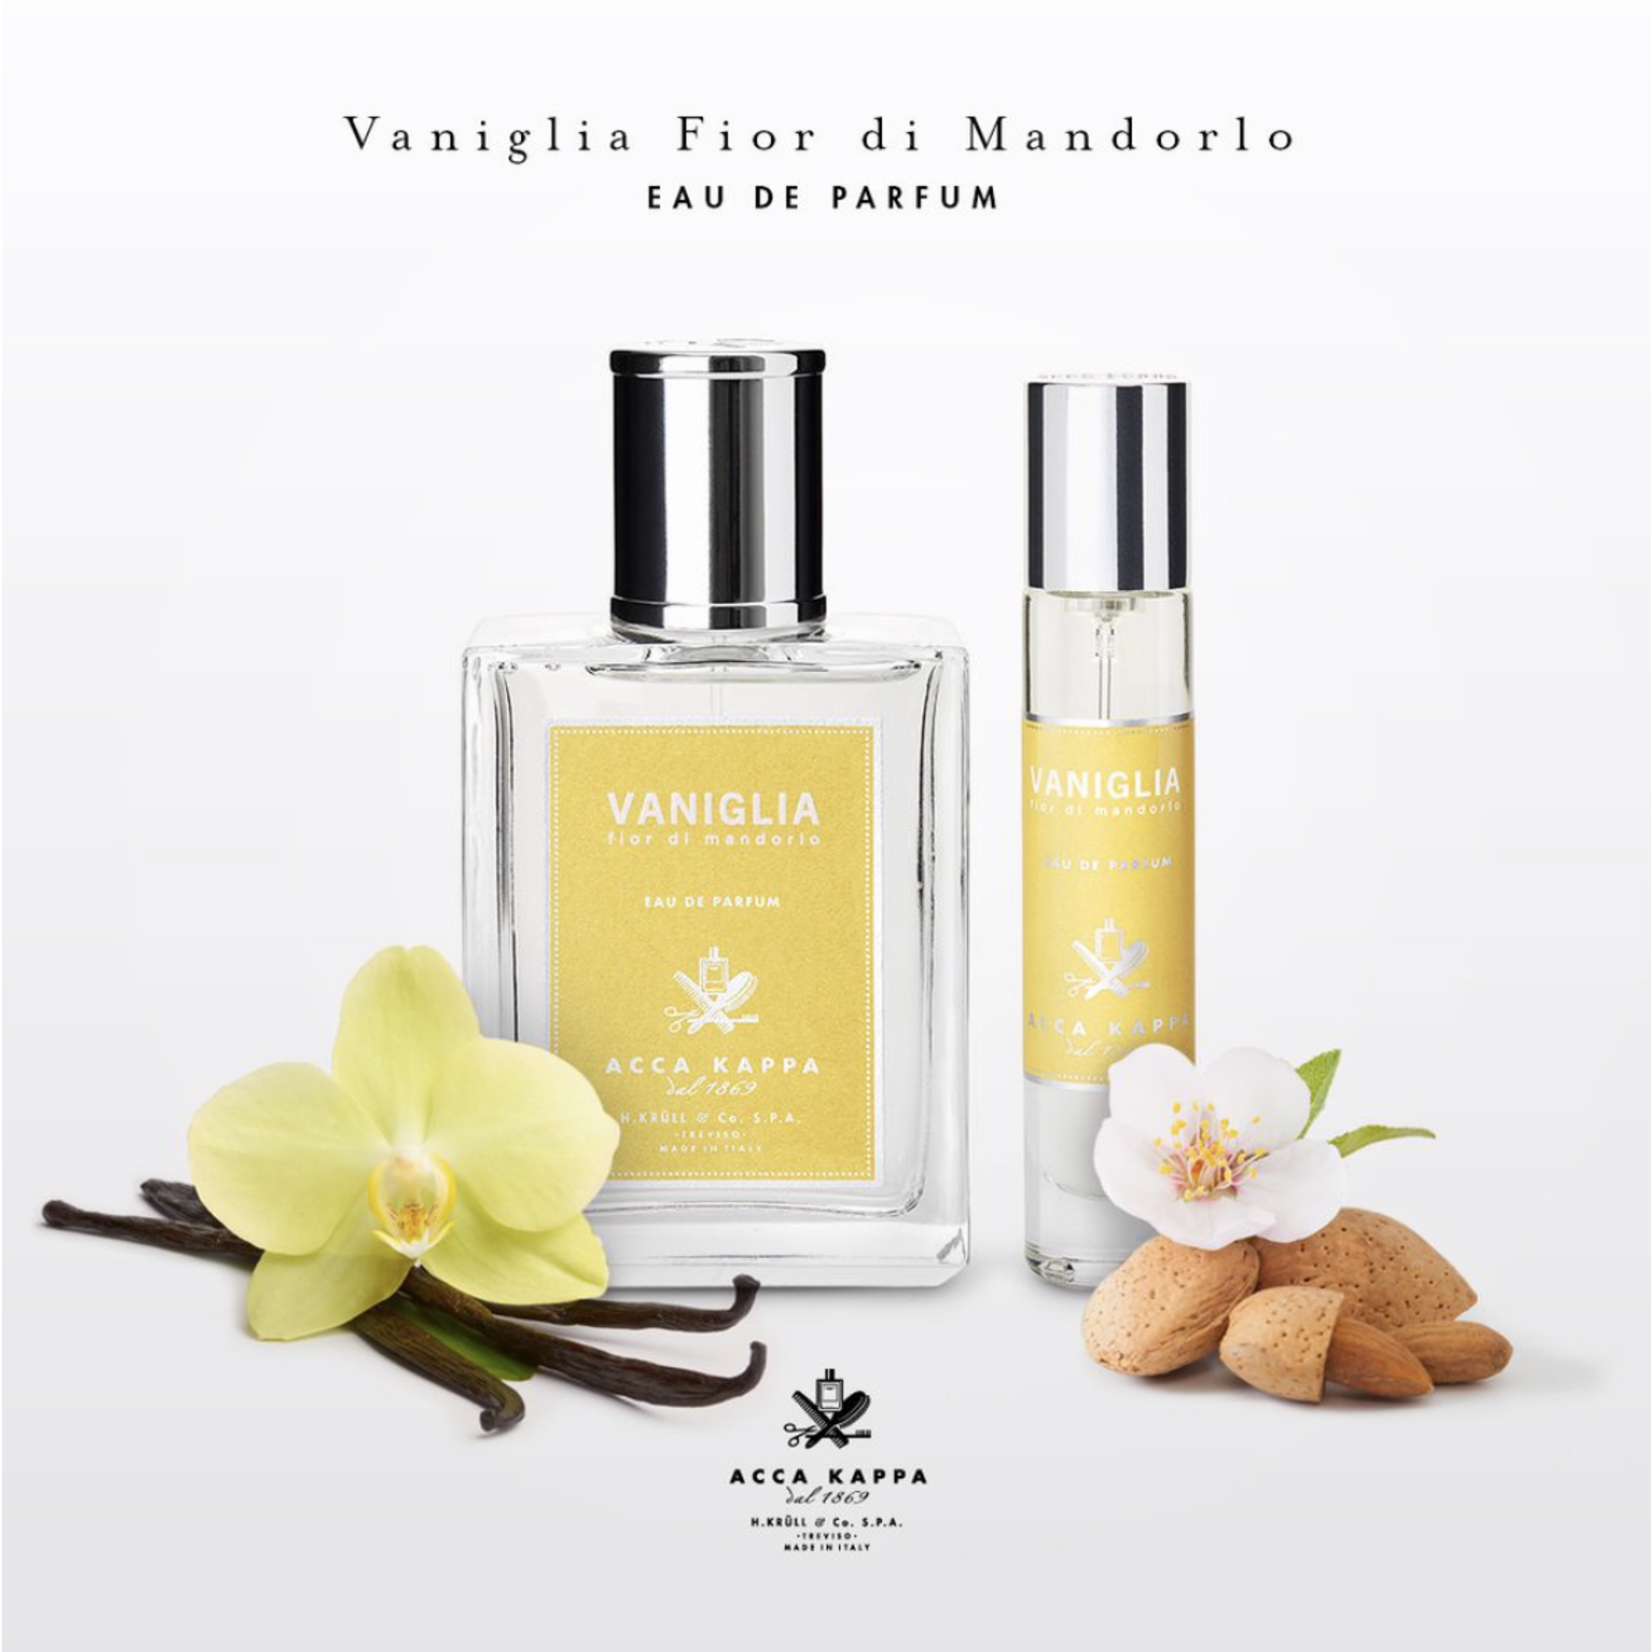 ACCA KAPPA ACCA KAPPA · VANIGLIA & FIOR DI MANDORLA 100ML